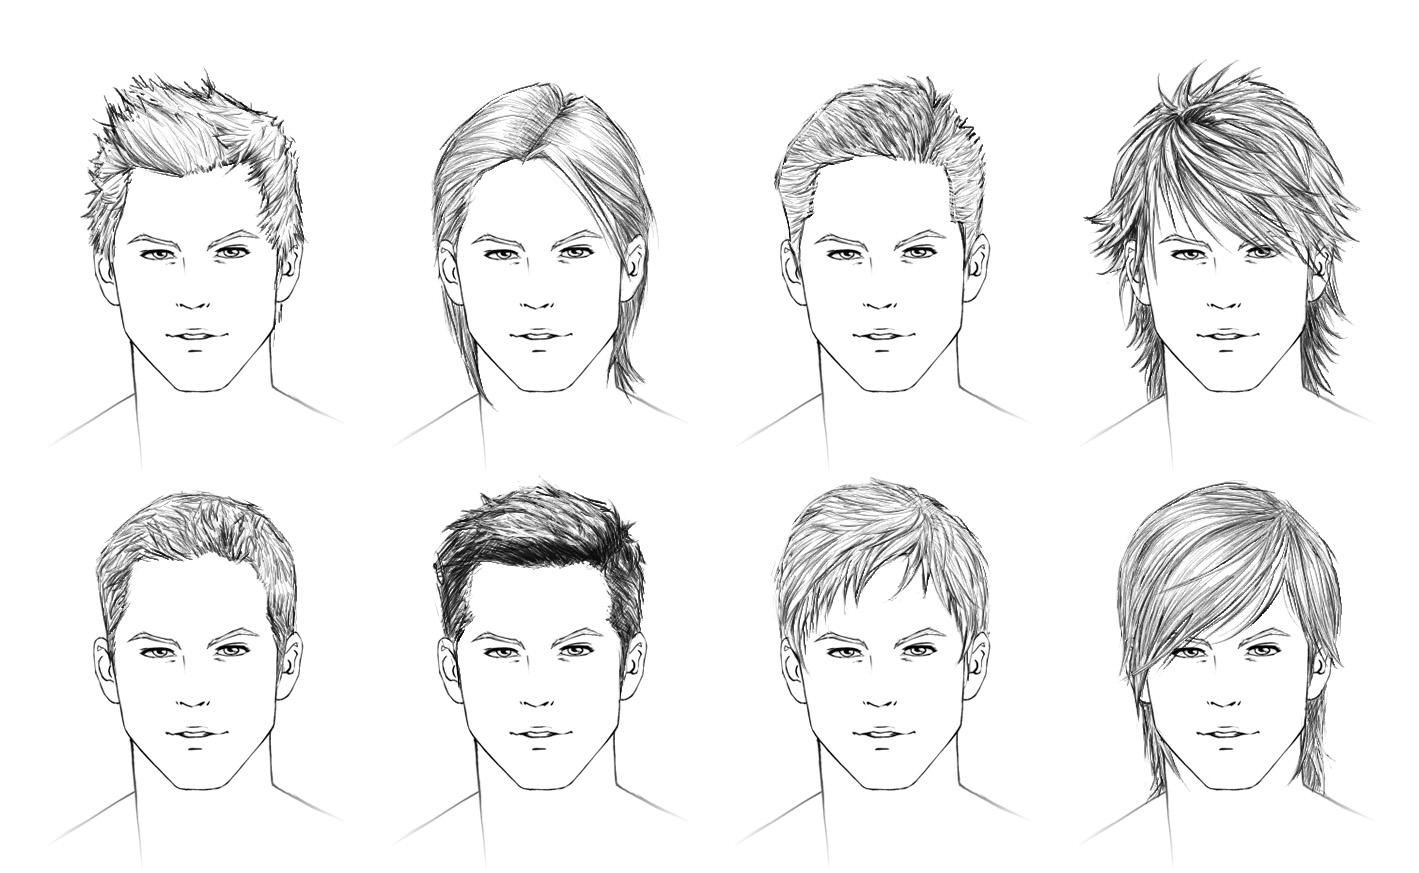 Peachy How To Draw Hair Male Sharenoesis Short Hairstyles For Black Women Fulllsitofus